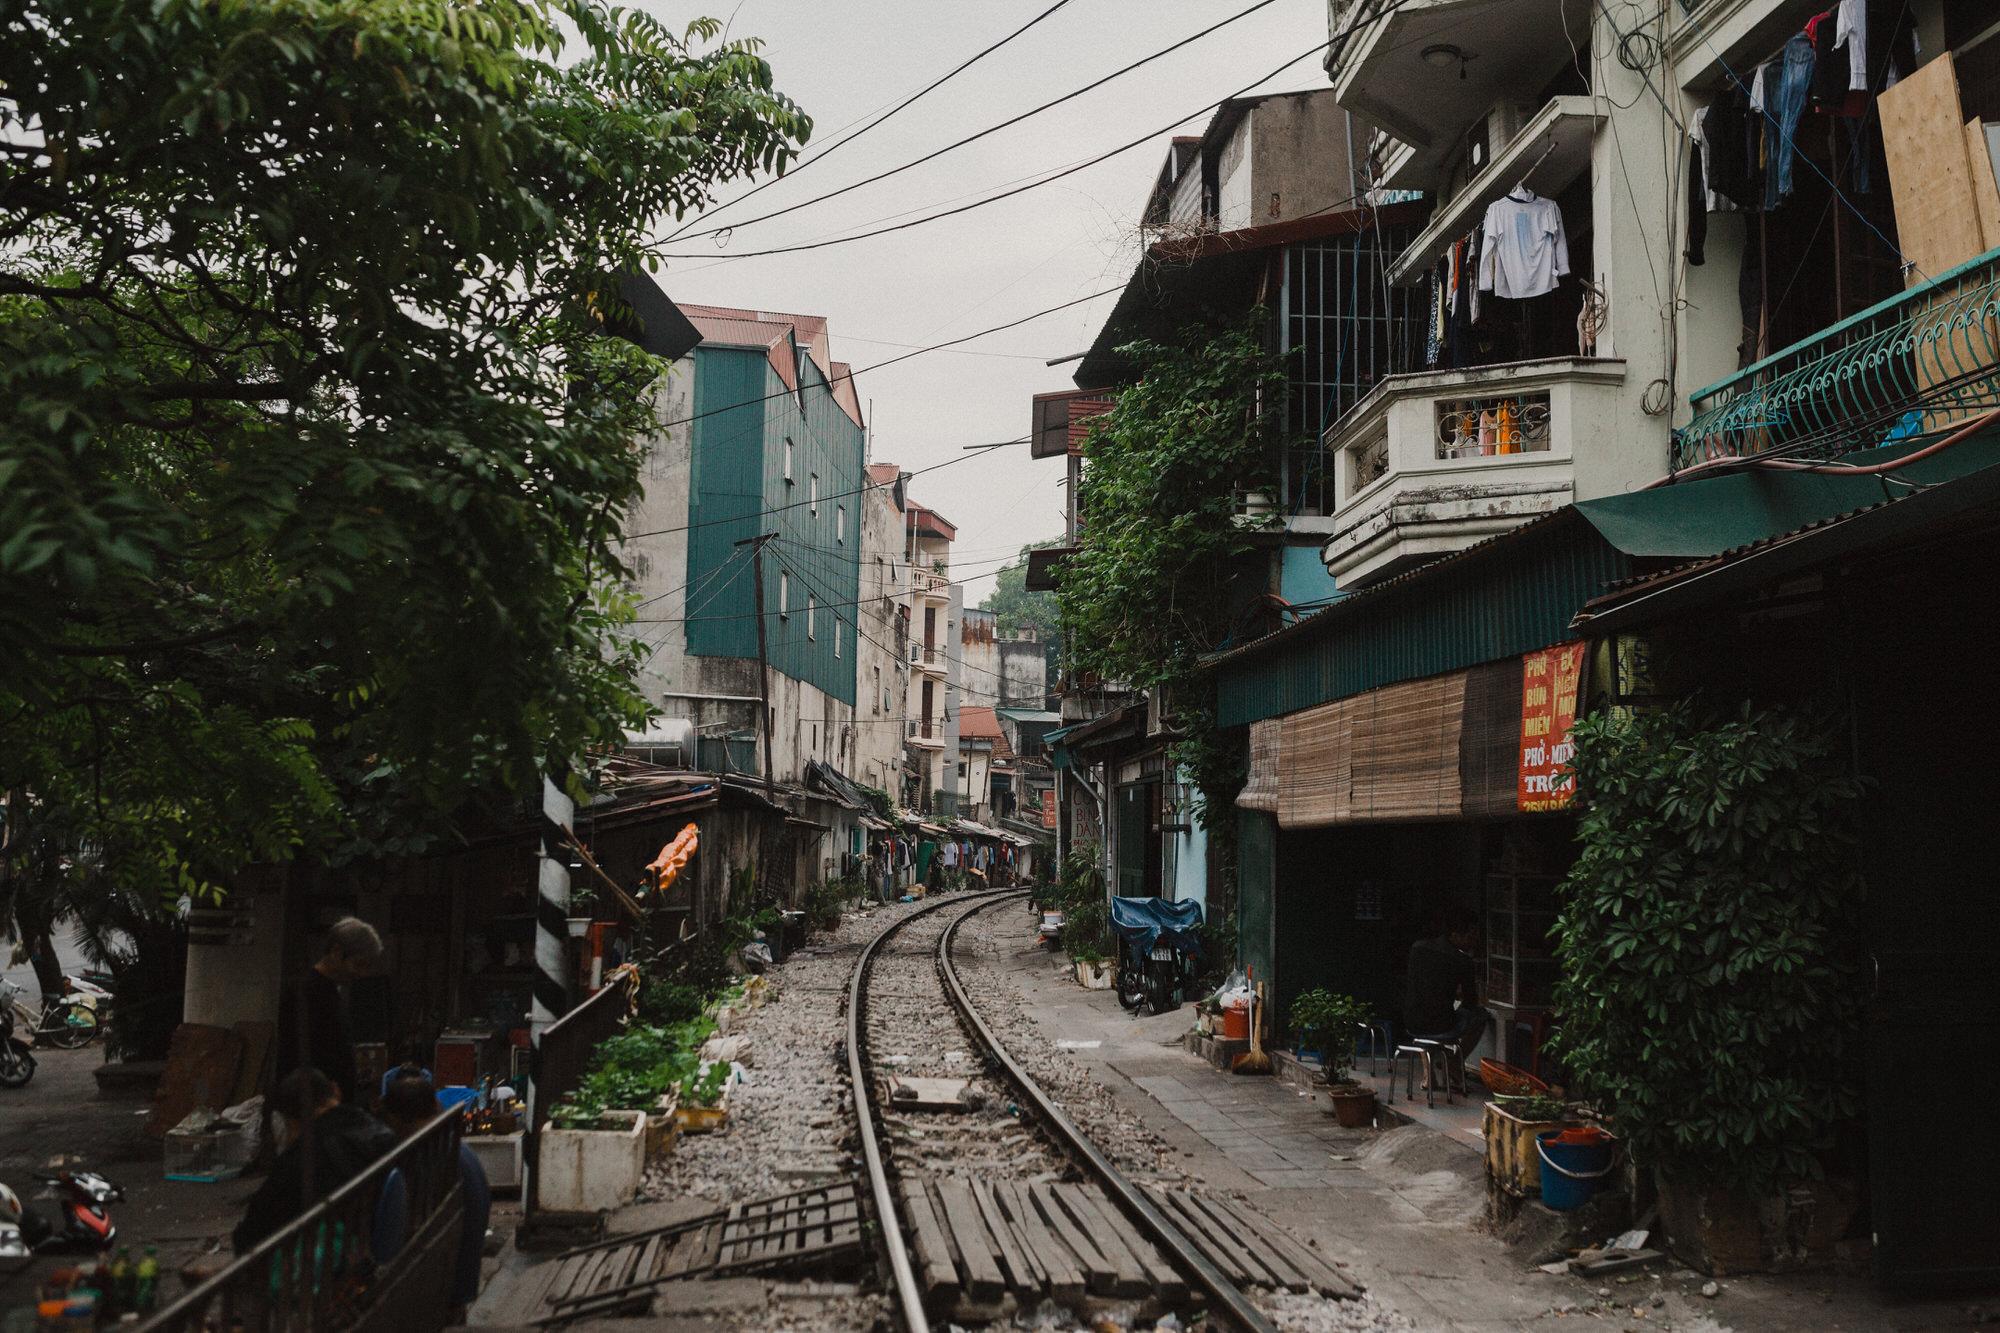 hanoivietnamcitytravelblog-9780-1.jpg